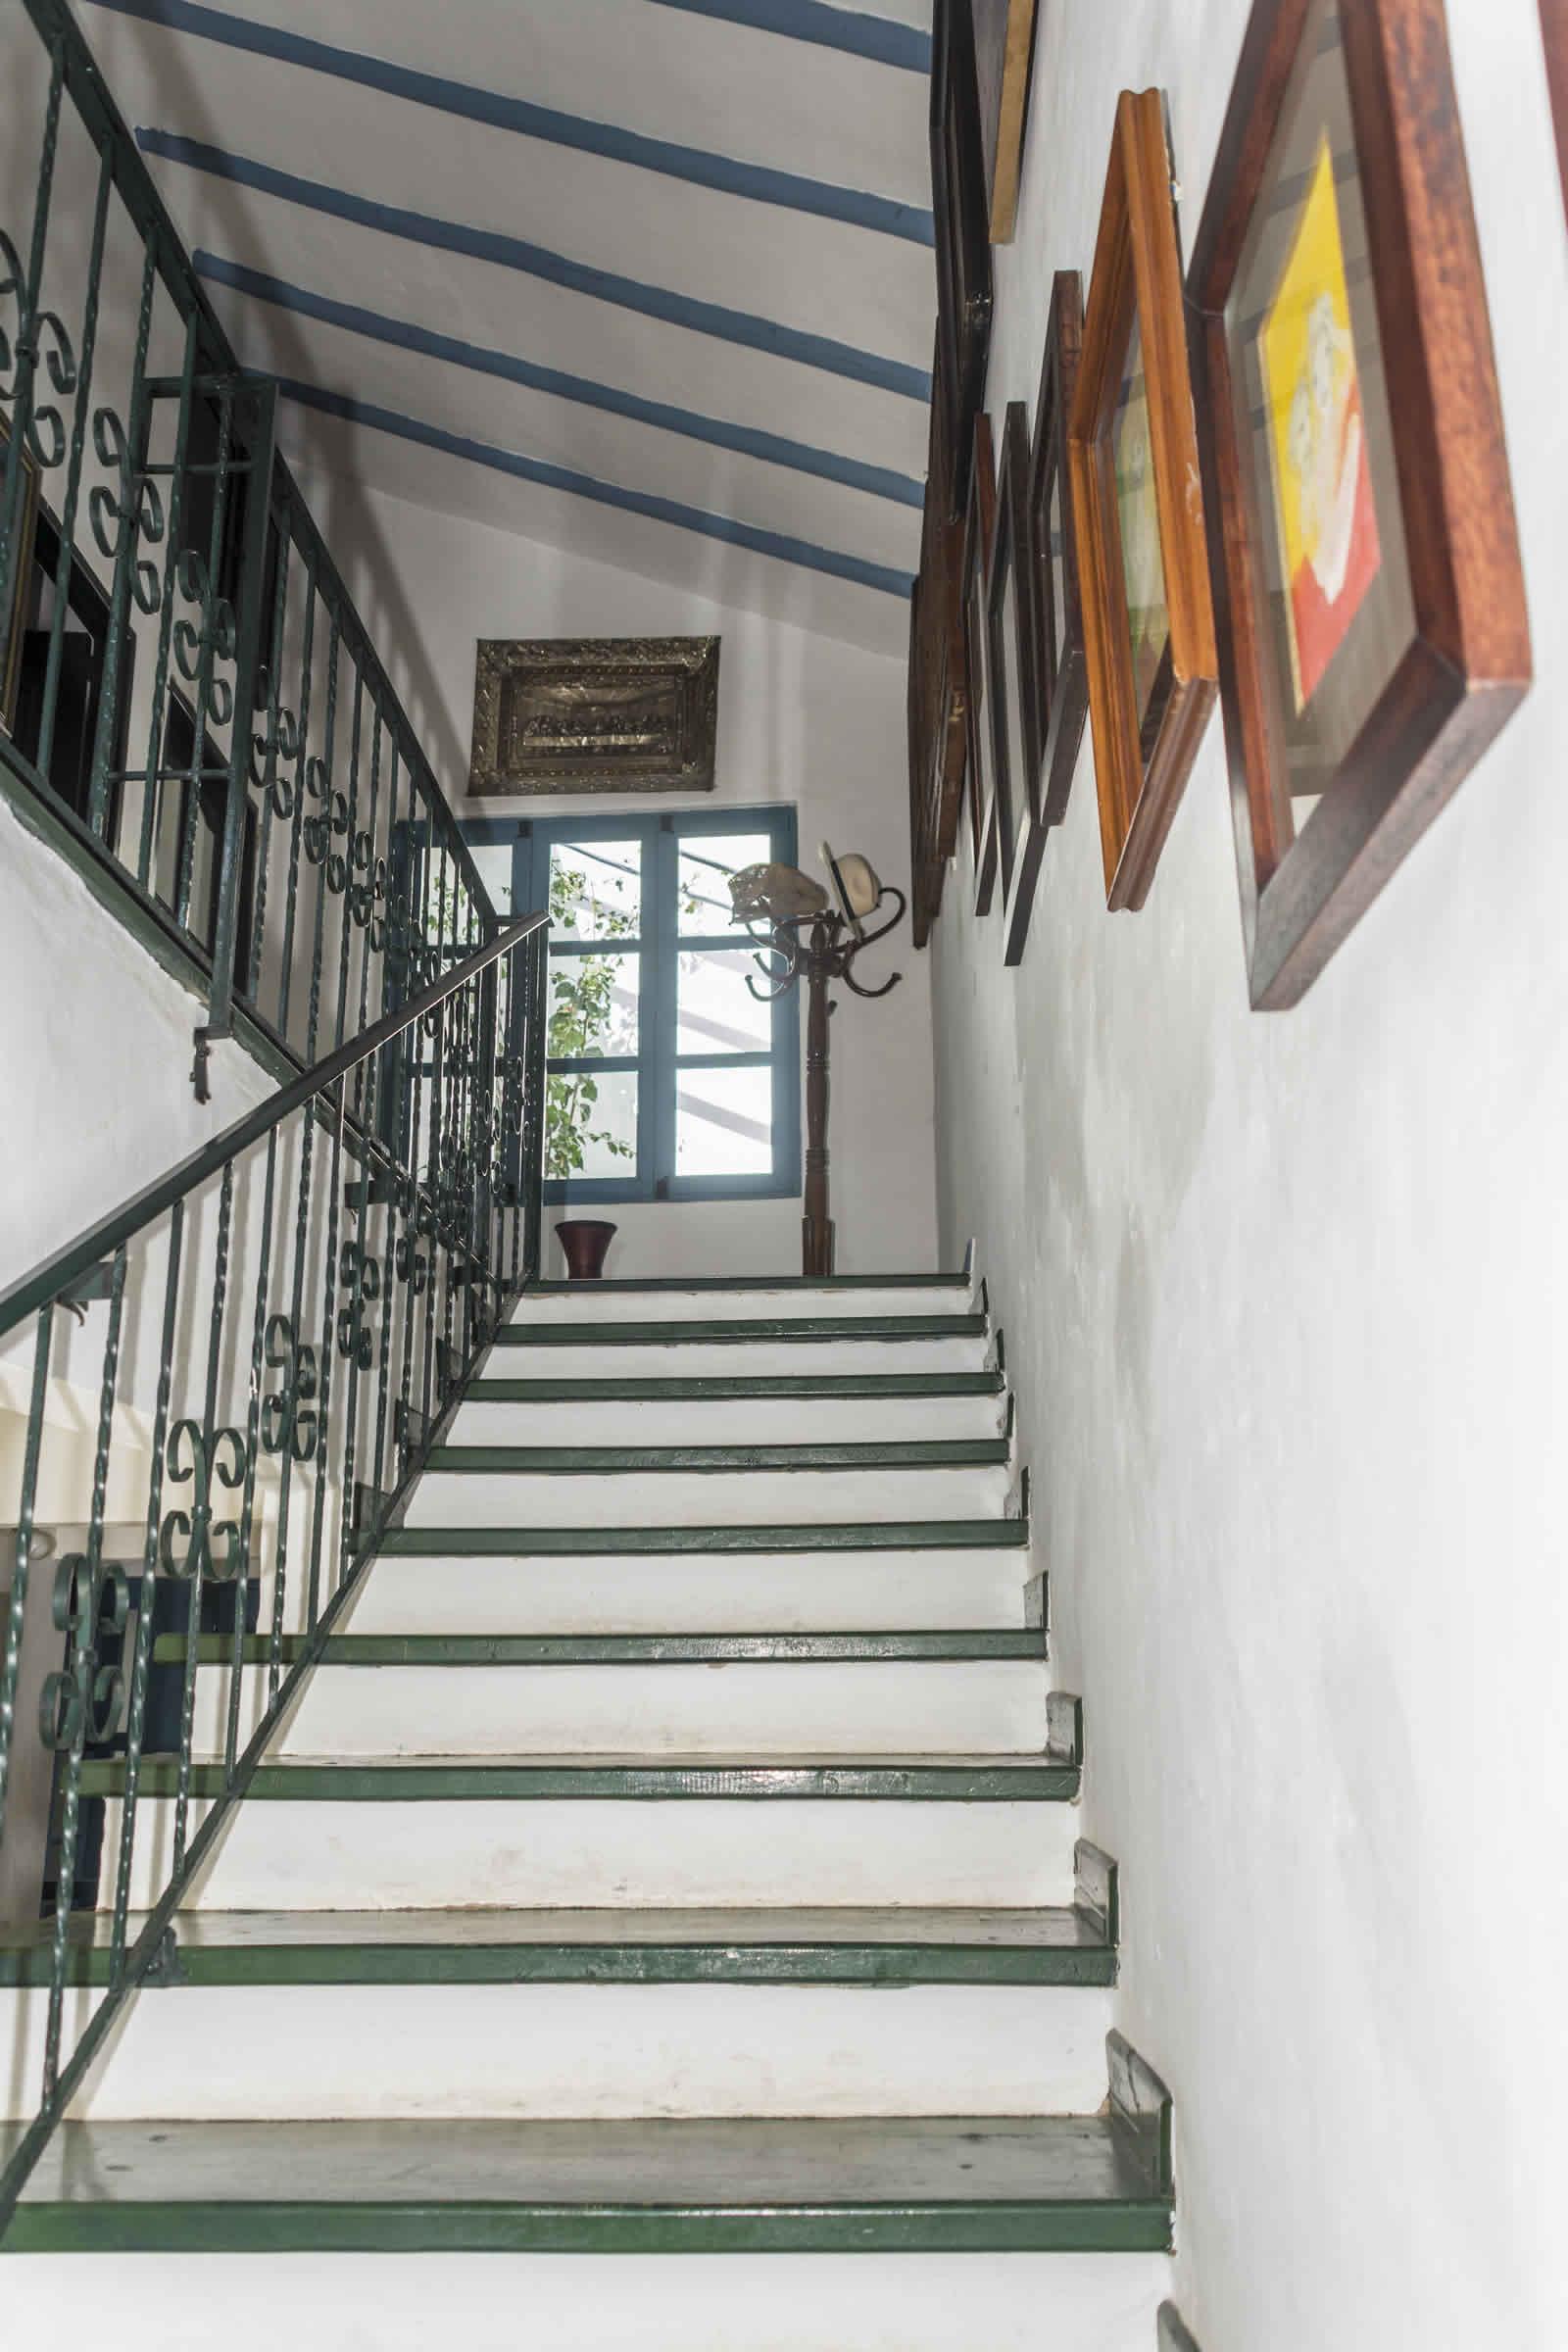 Alquiler casa Tulato Villa de Leyva escalera